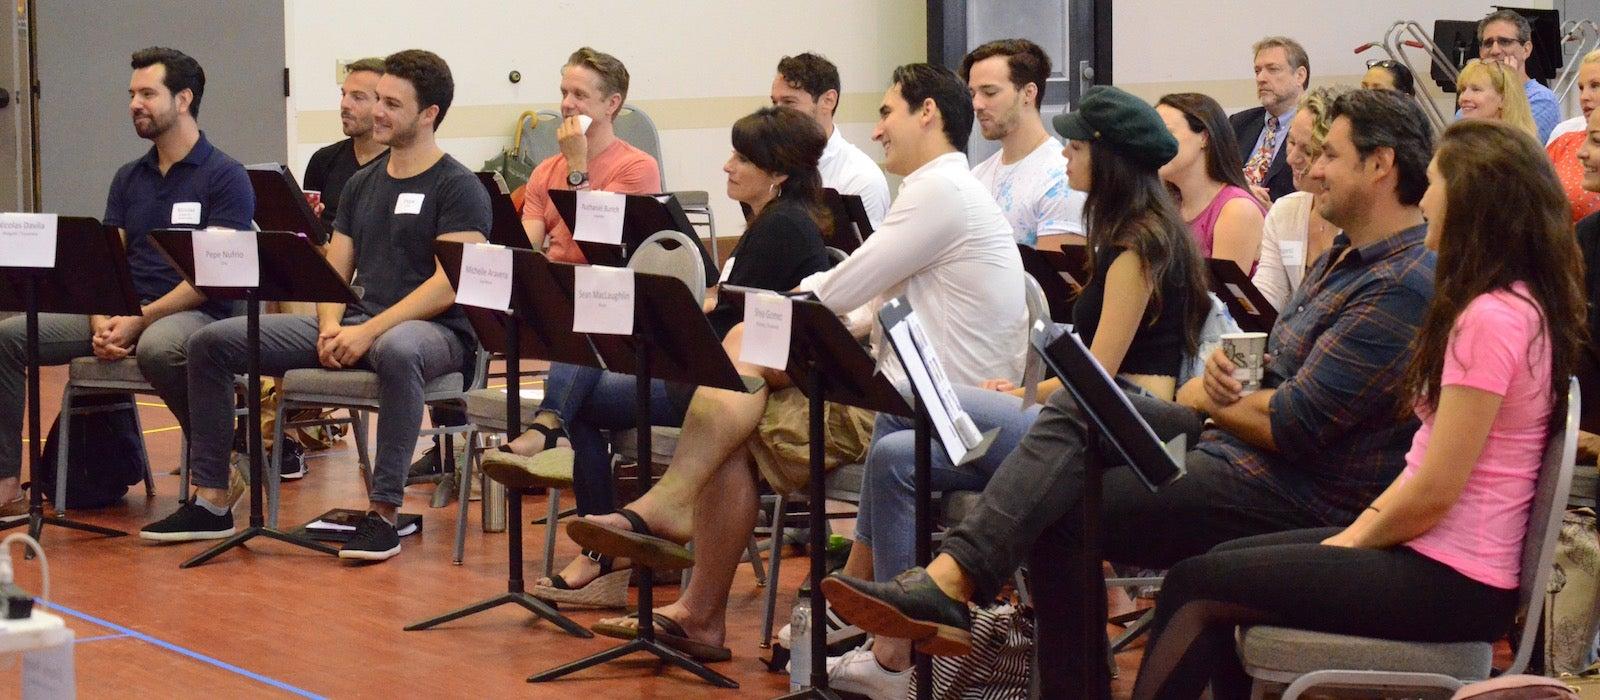 evita-first-rehearsal-slider.jpg